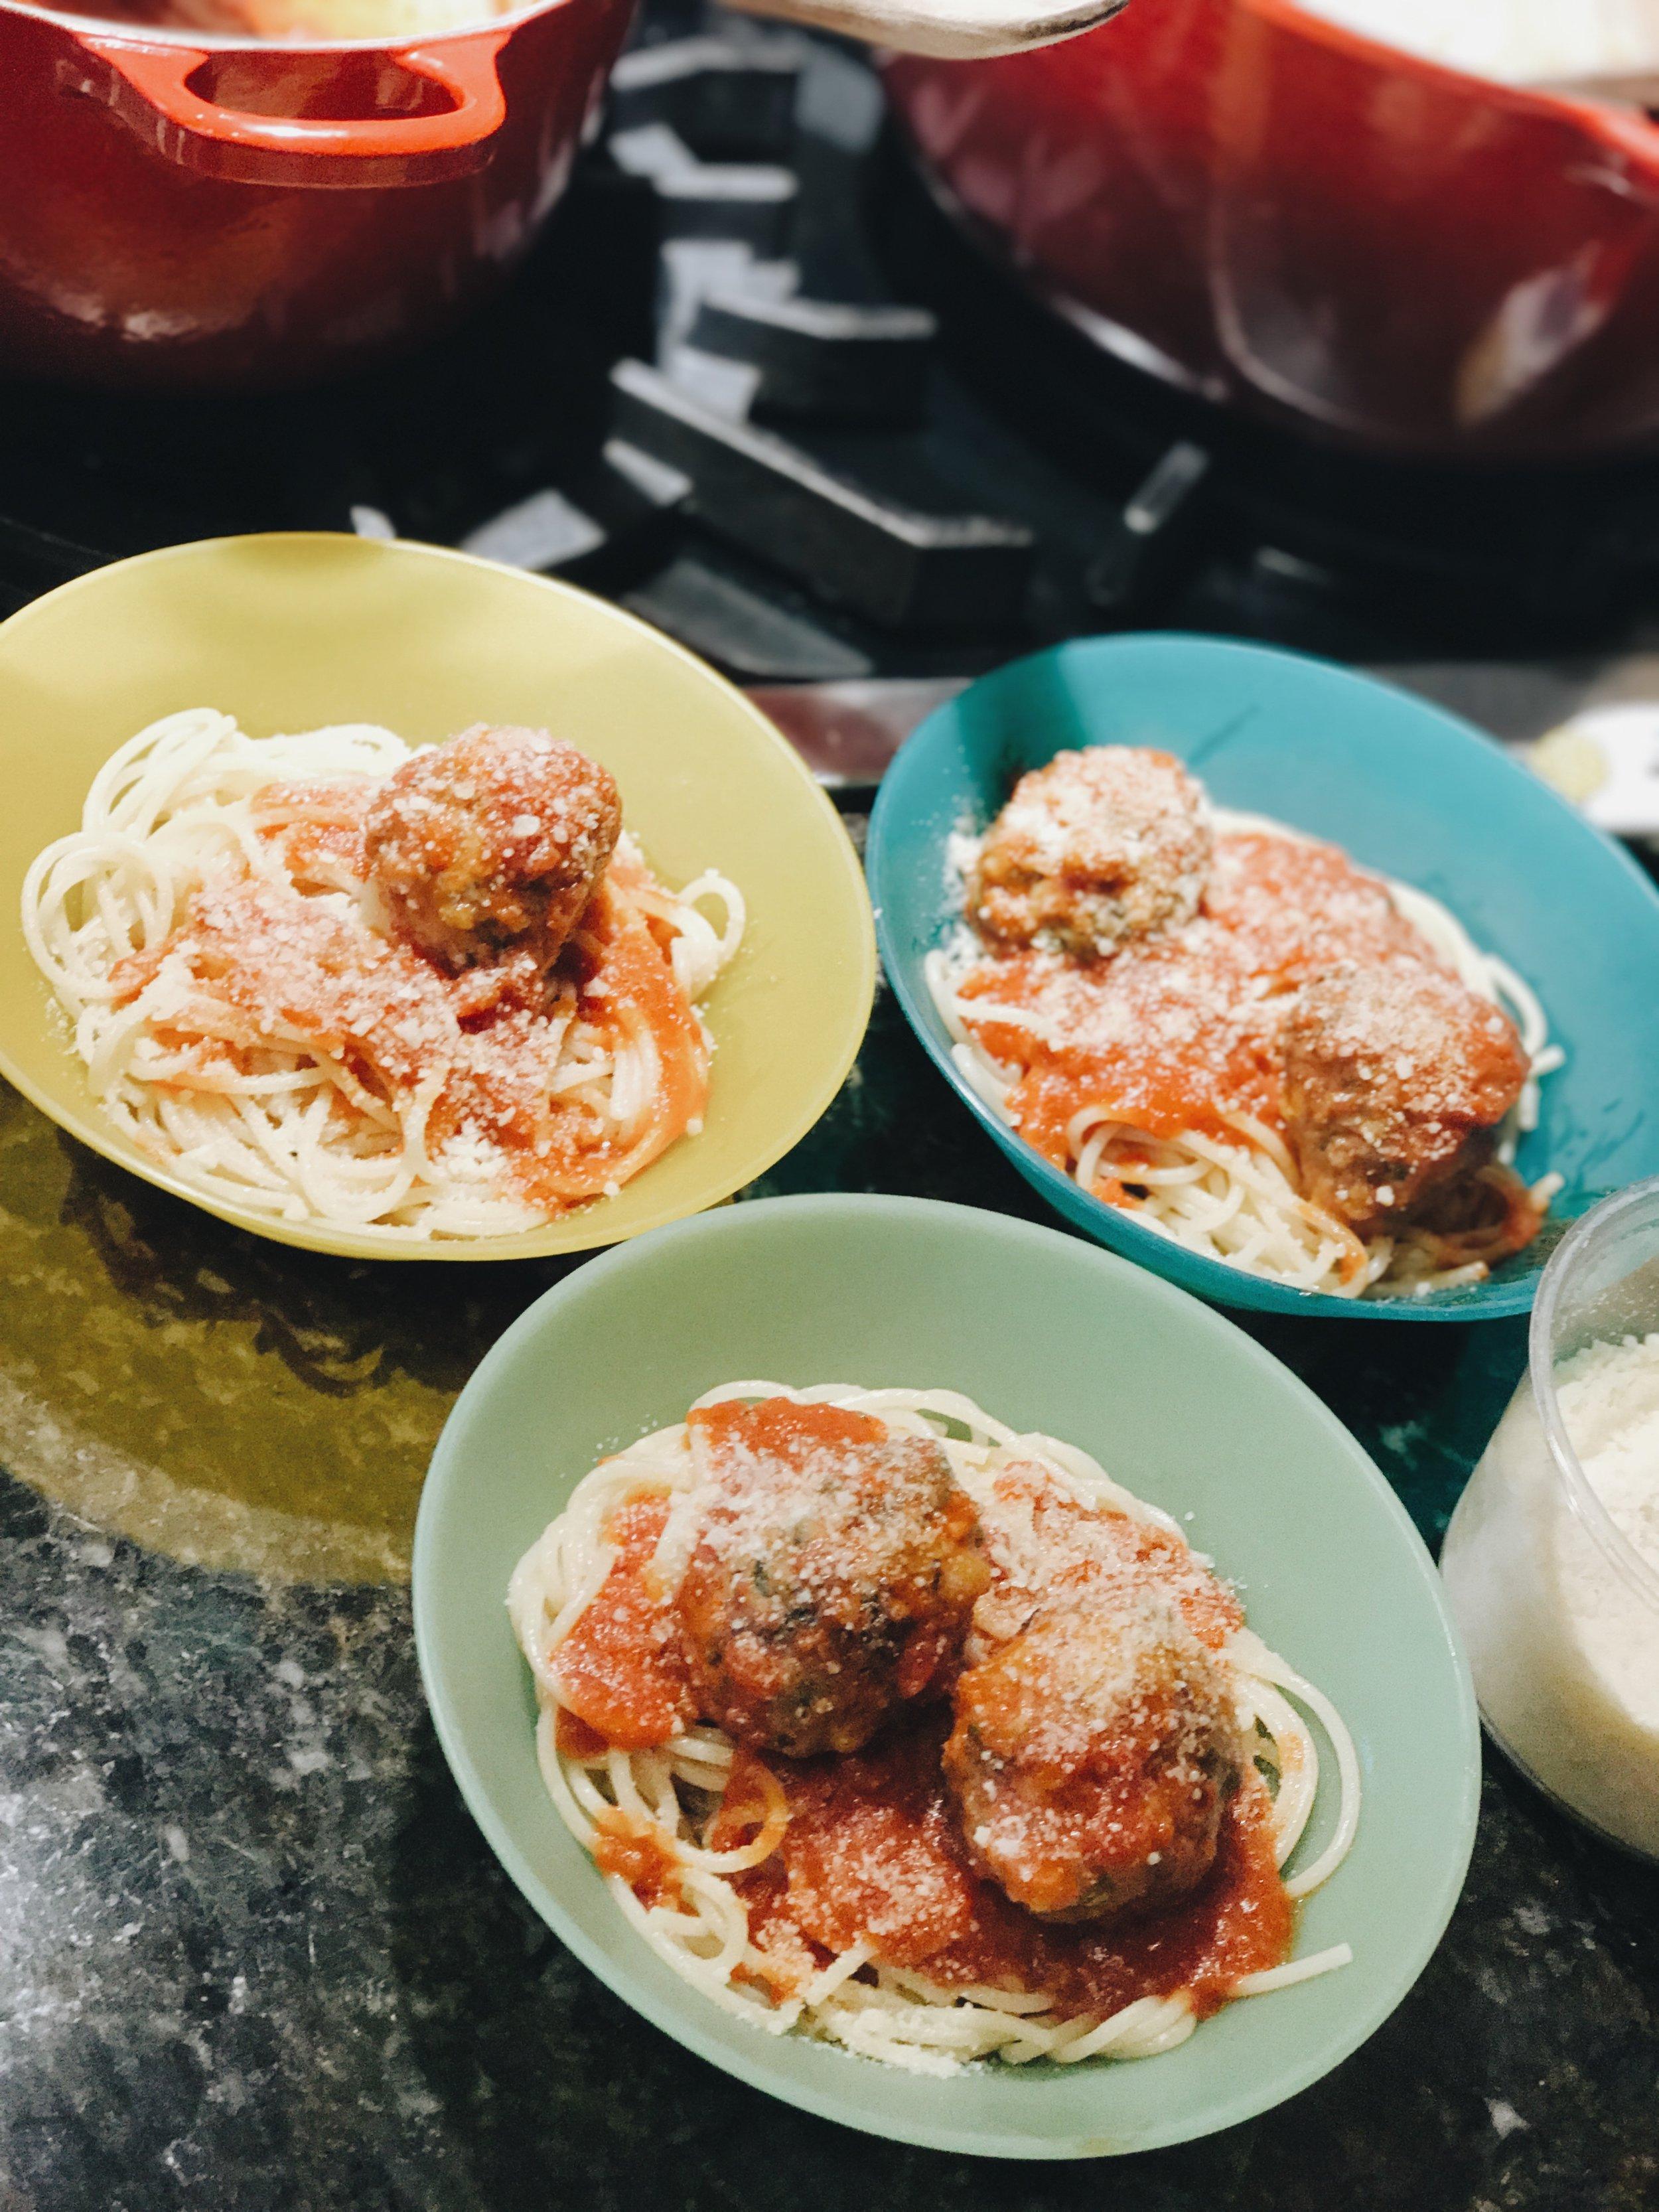 Momlikethat-spaghetti meatballs.JPG